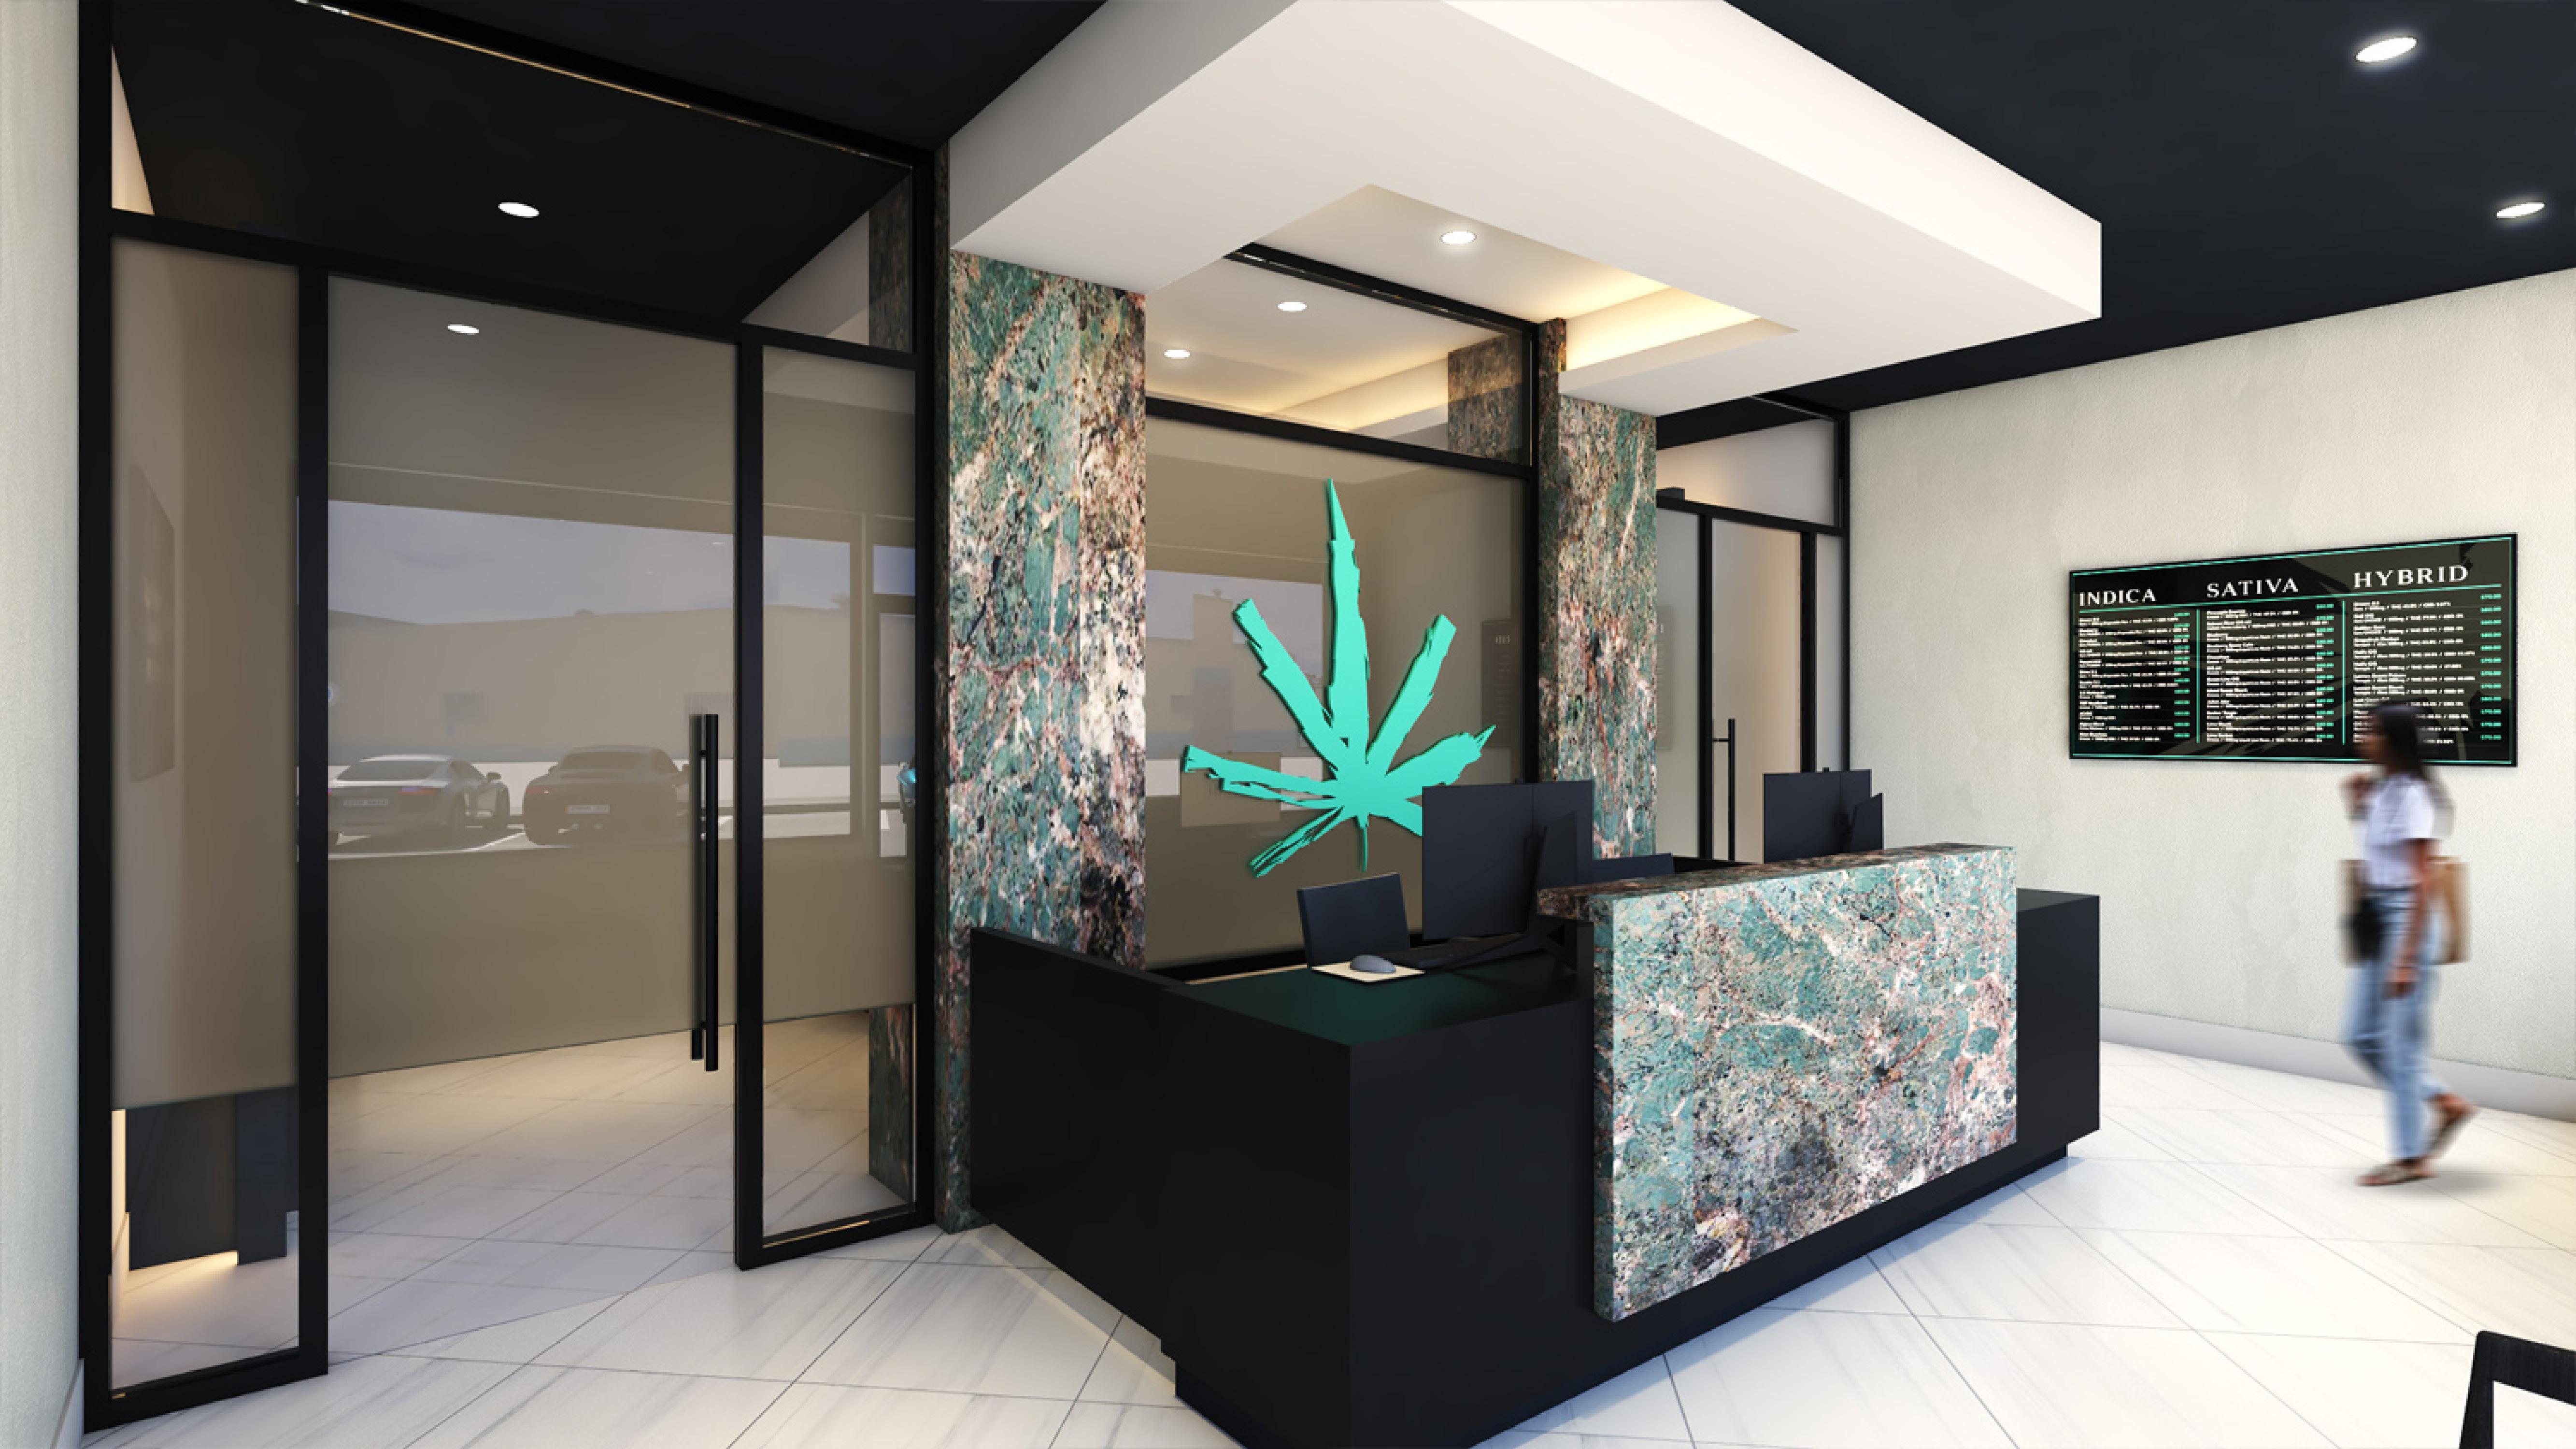 Elevate Dispensary in Vineyard, CA- Interior Design by High Road Studio - Coming Soon